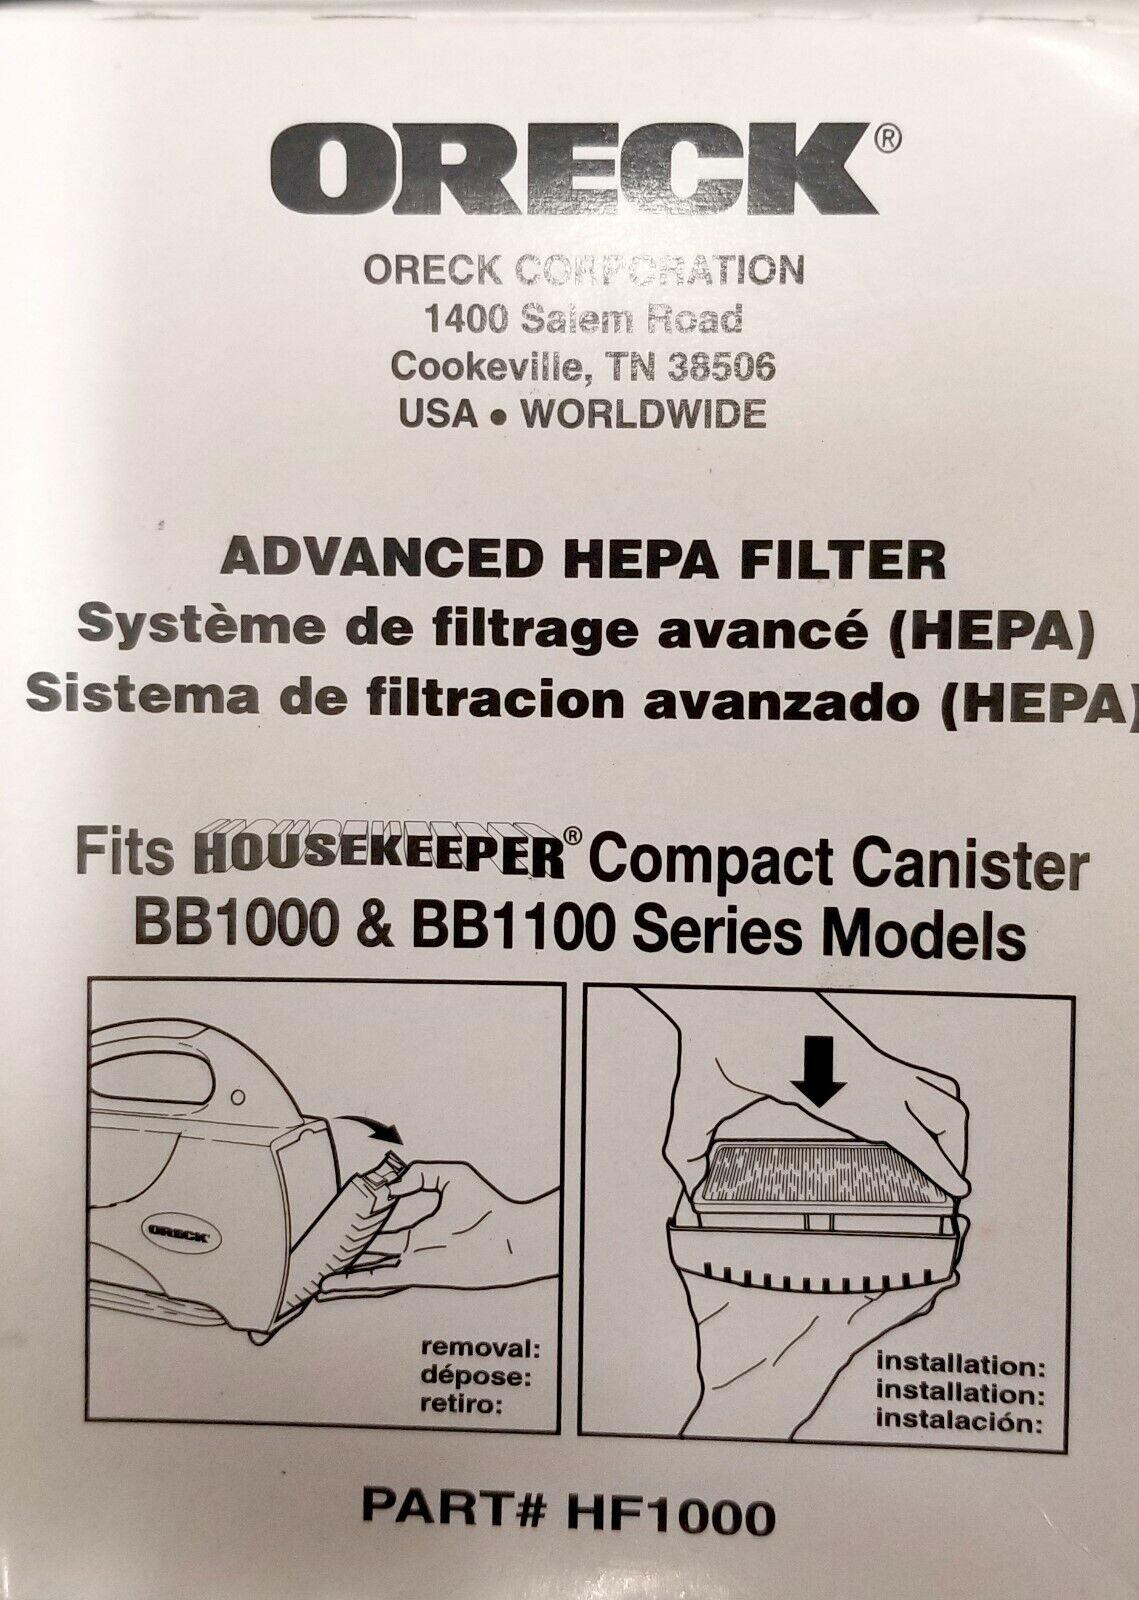 diagram of oreck oreck advanced hf1000 hepa filter for housekeeper bb1000 bb1100 diagram of orca oreck advanced hf1000 hepa filter for